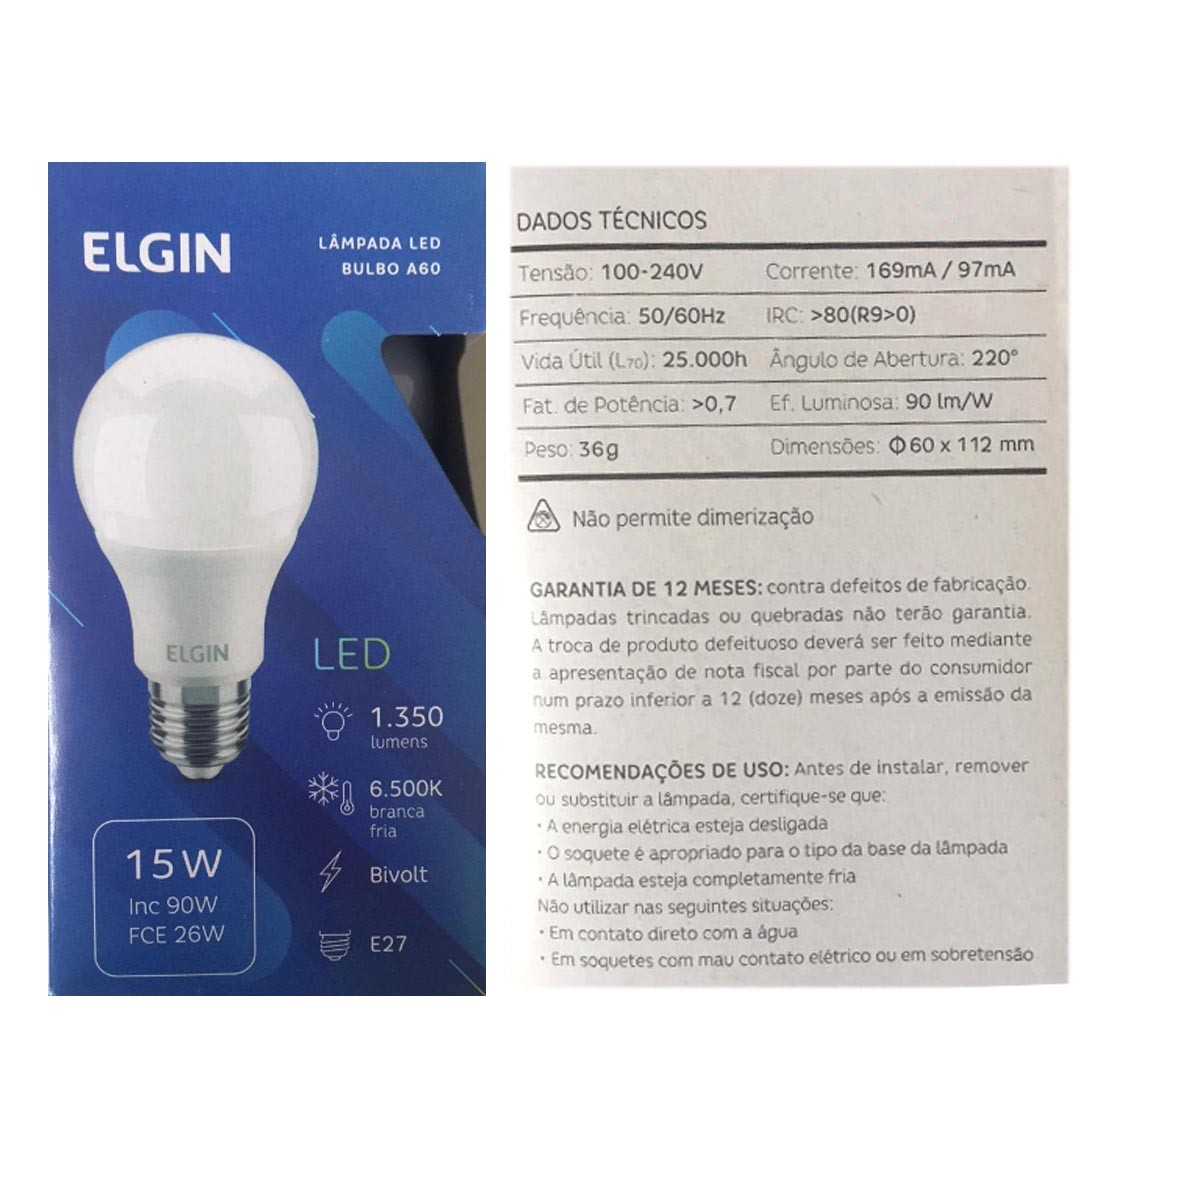 Lâmpada Elgin Led Bulbo A60 15w E27 6500K Bivolt